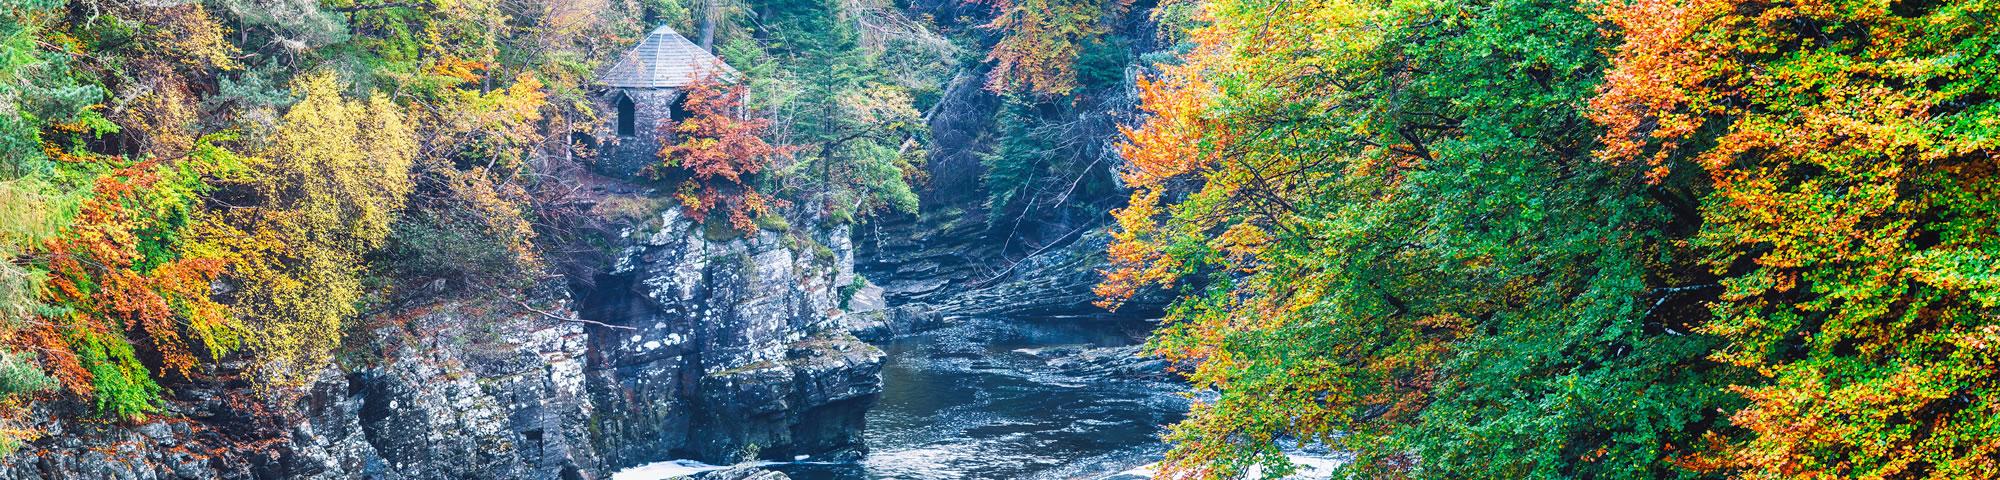 Invermoriston Falls with the Summer House at autumn.